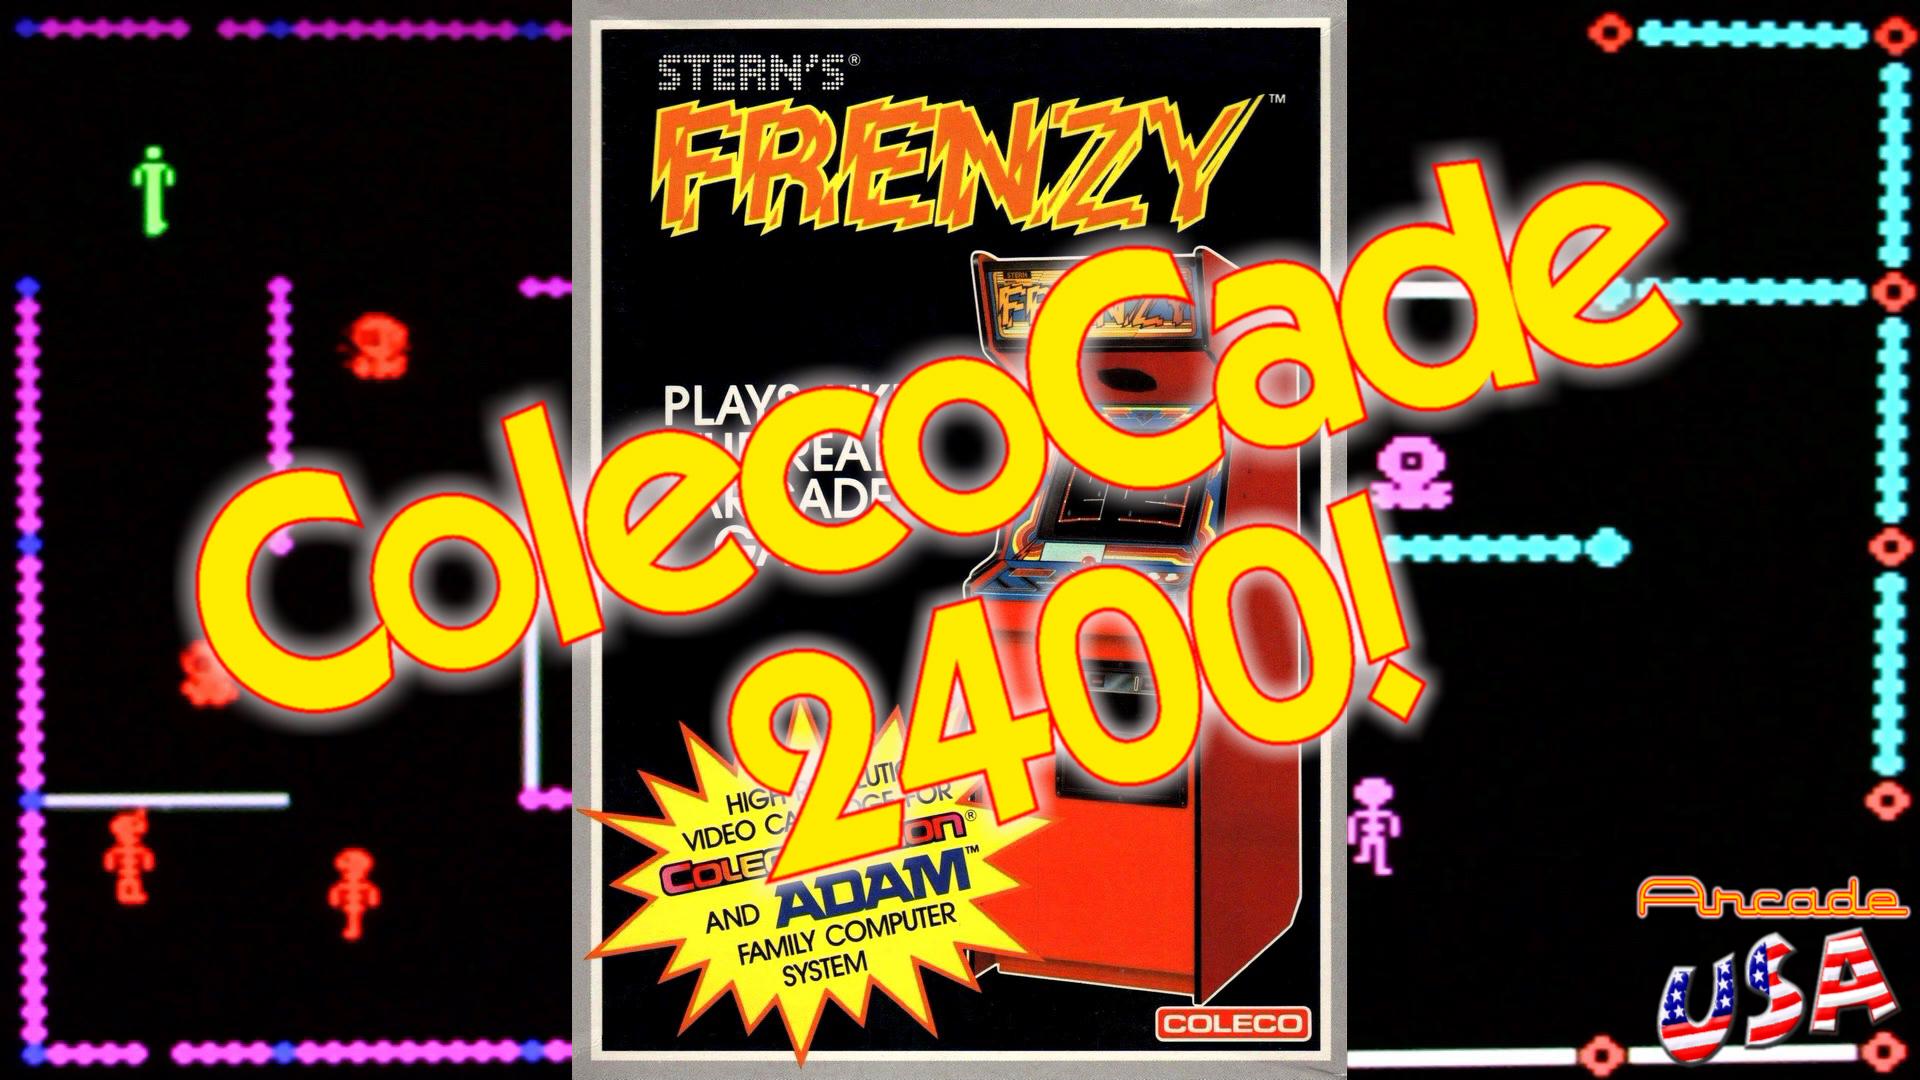 ColecoCade 2400 - Frenzy! show art